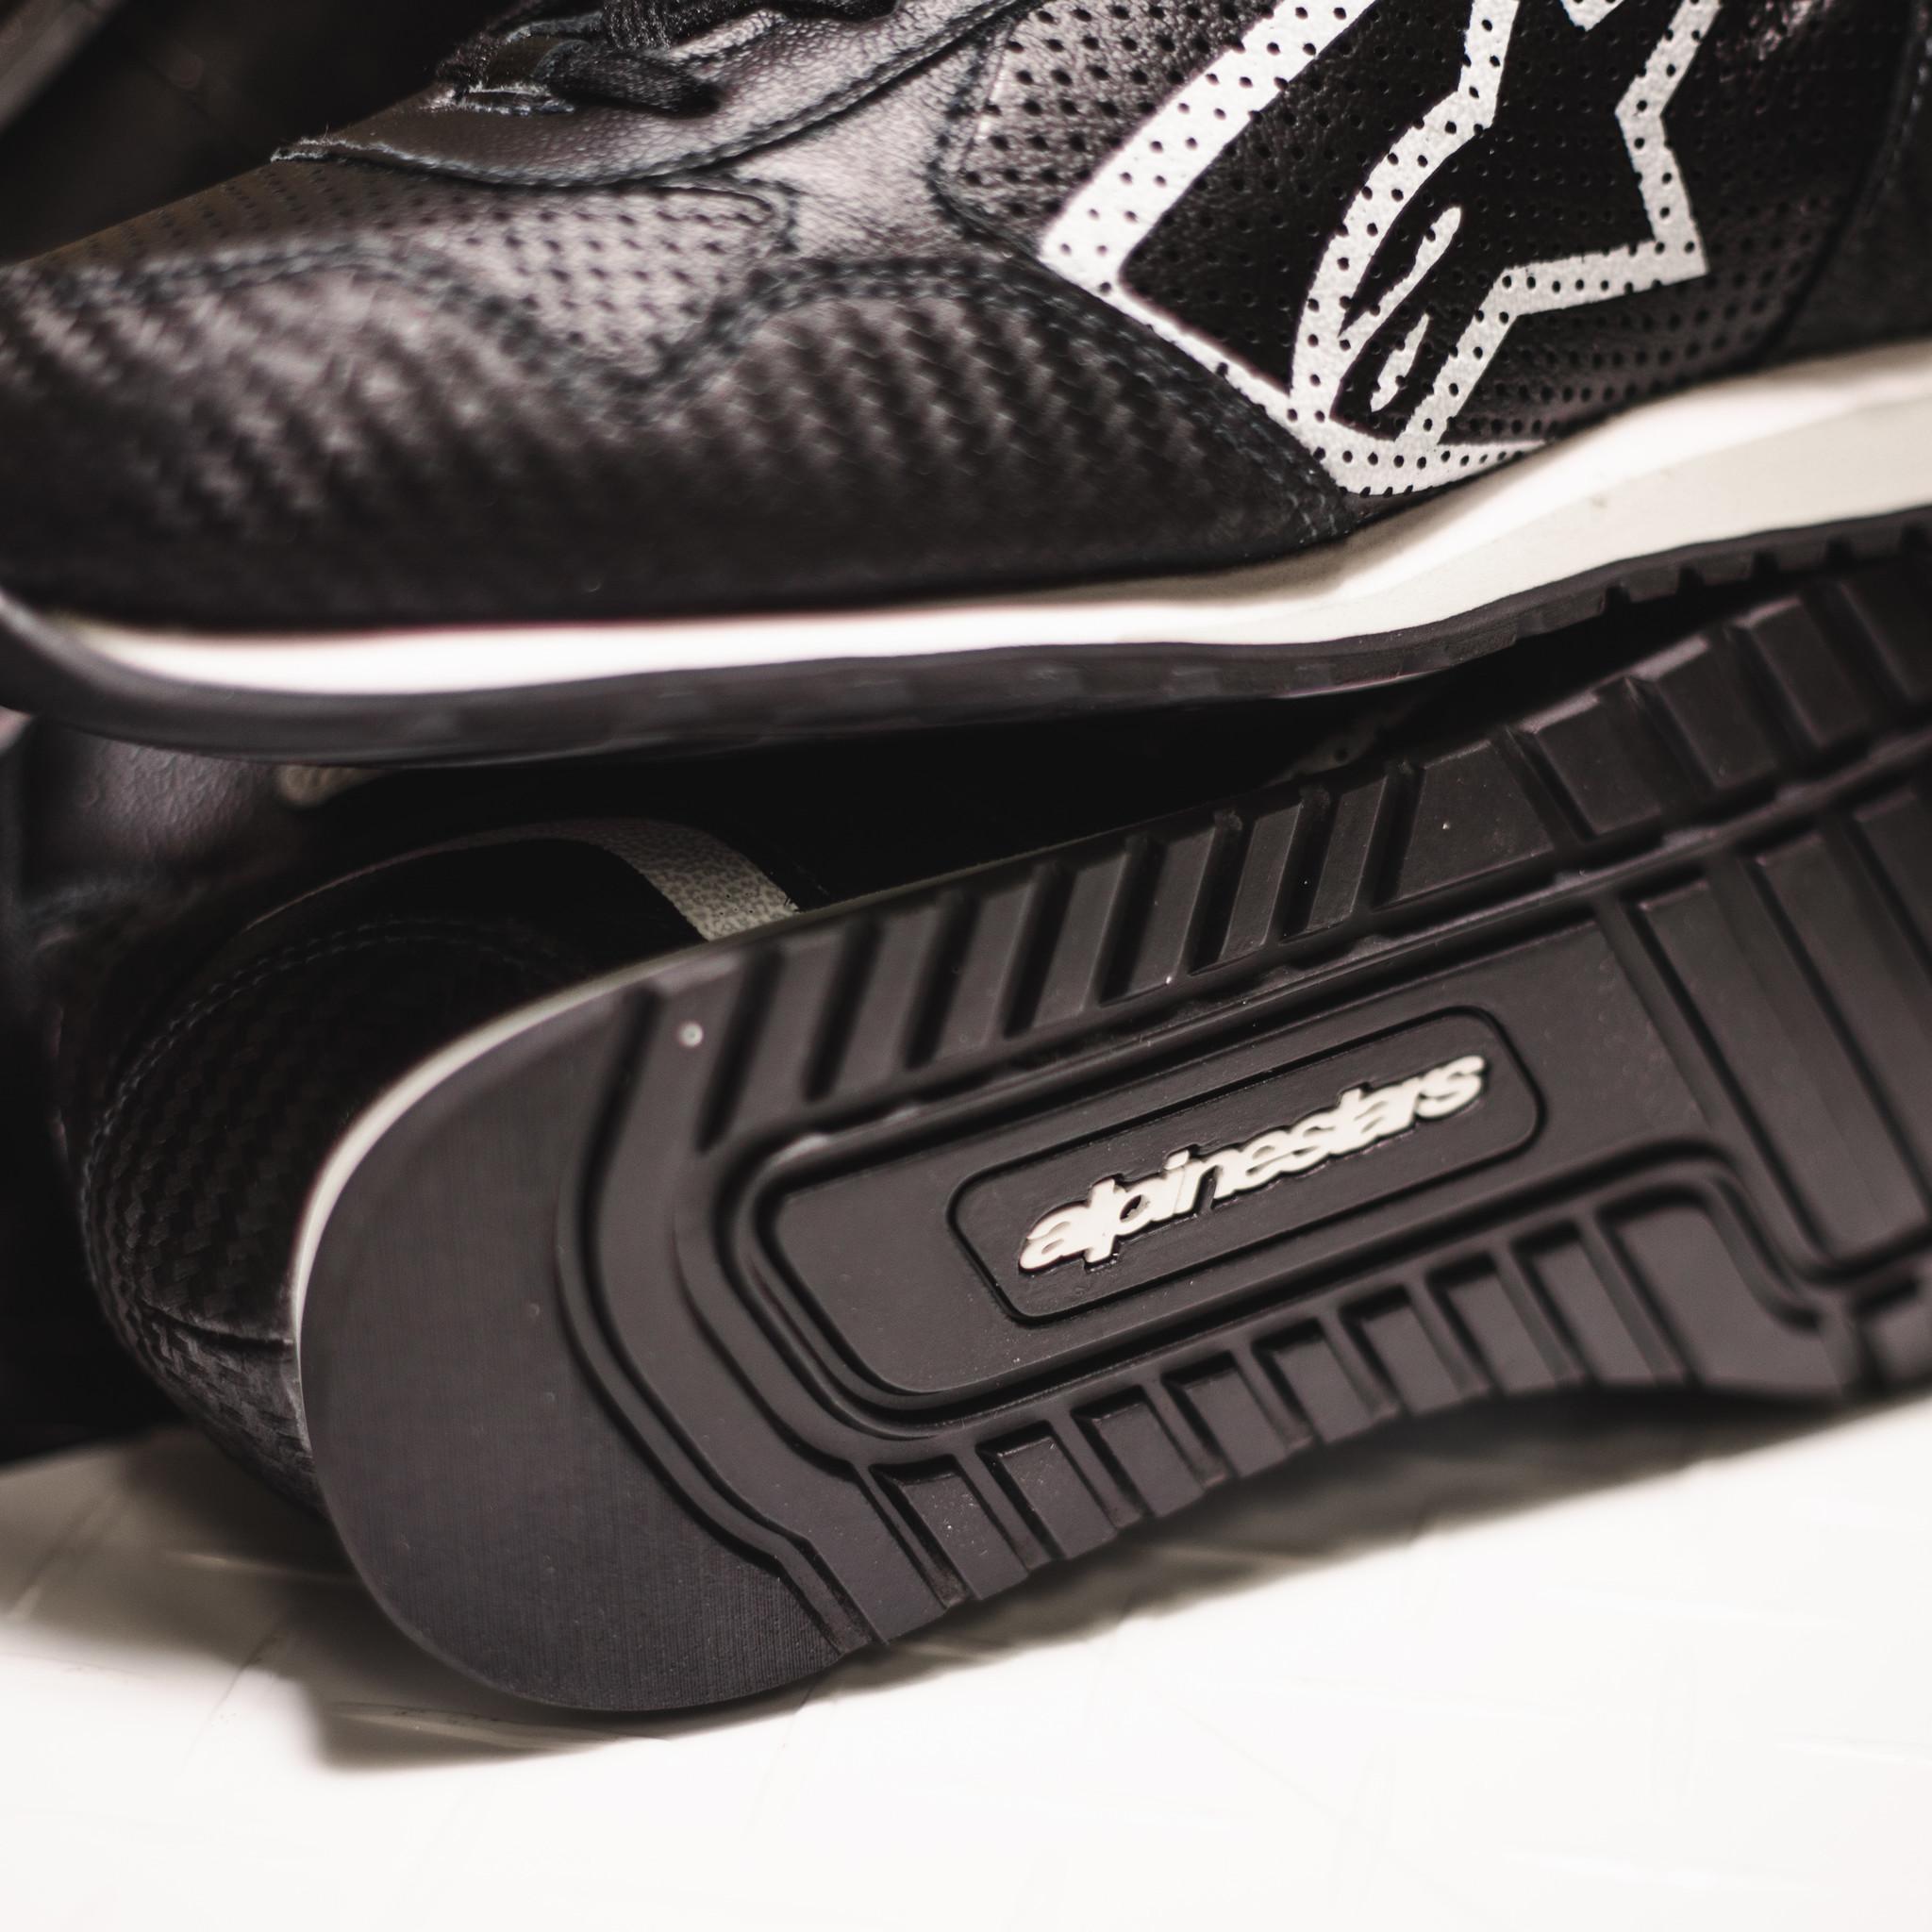 Alpinestars Radar Shoe